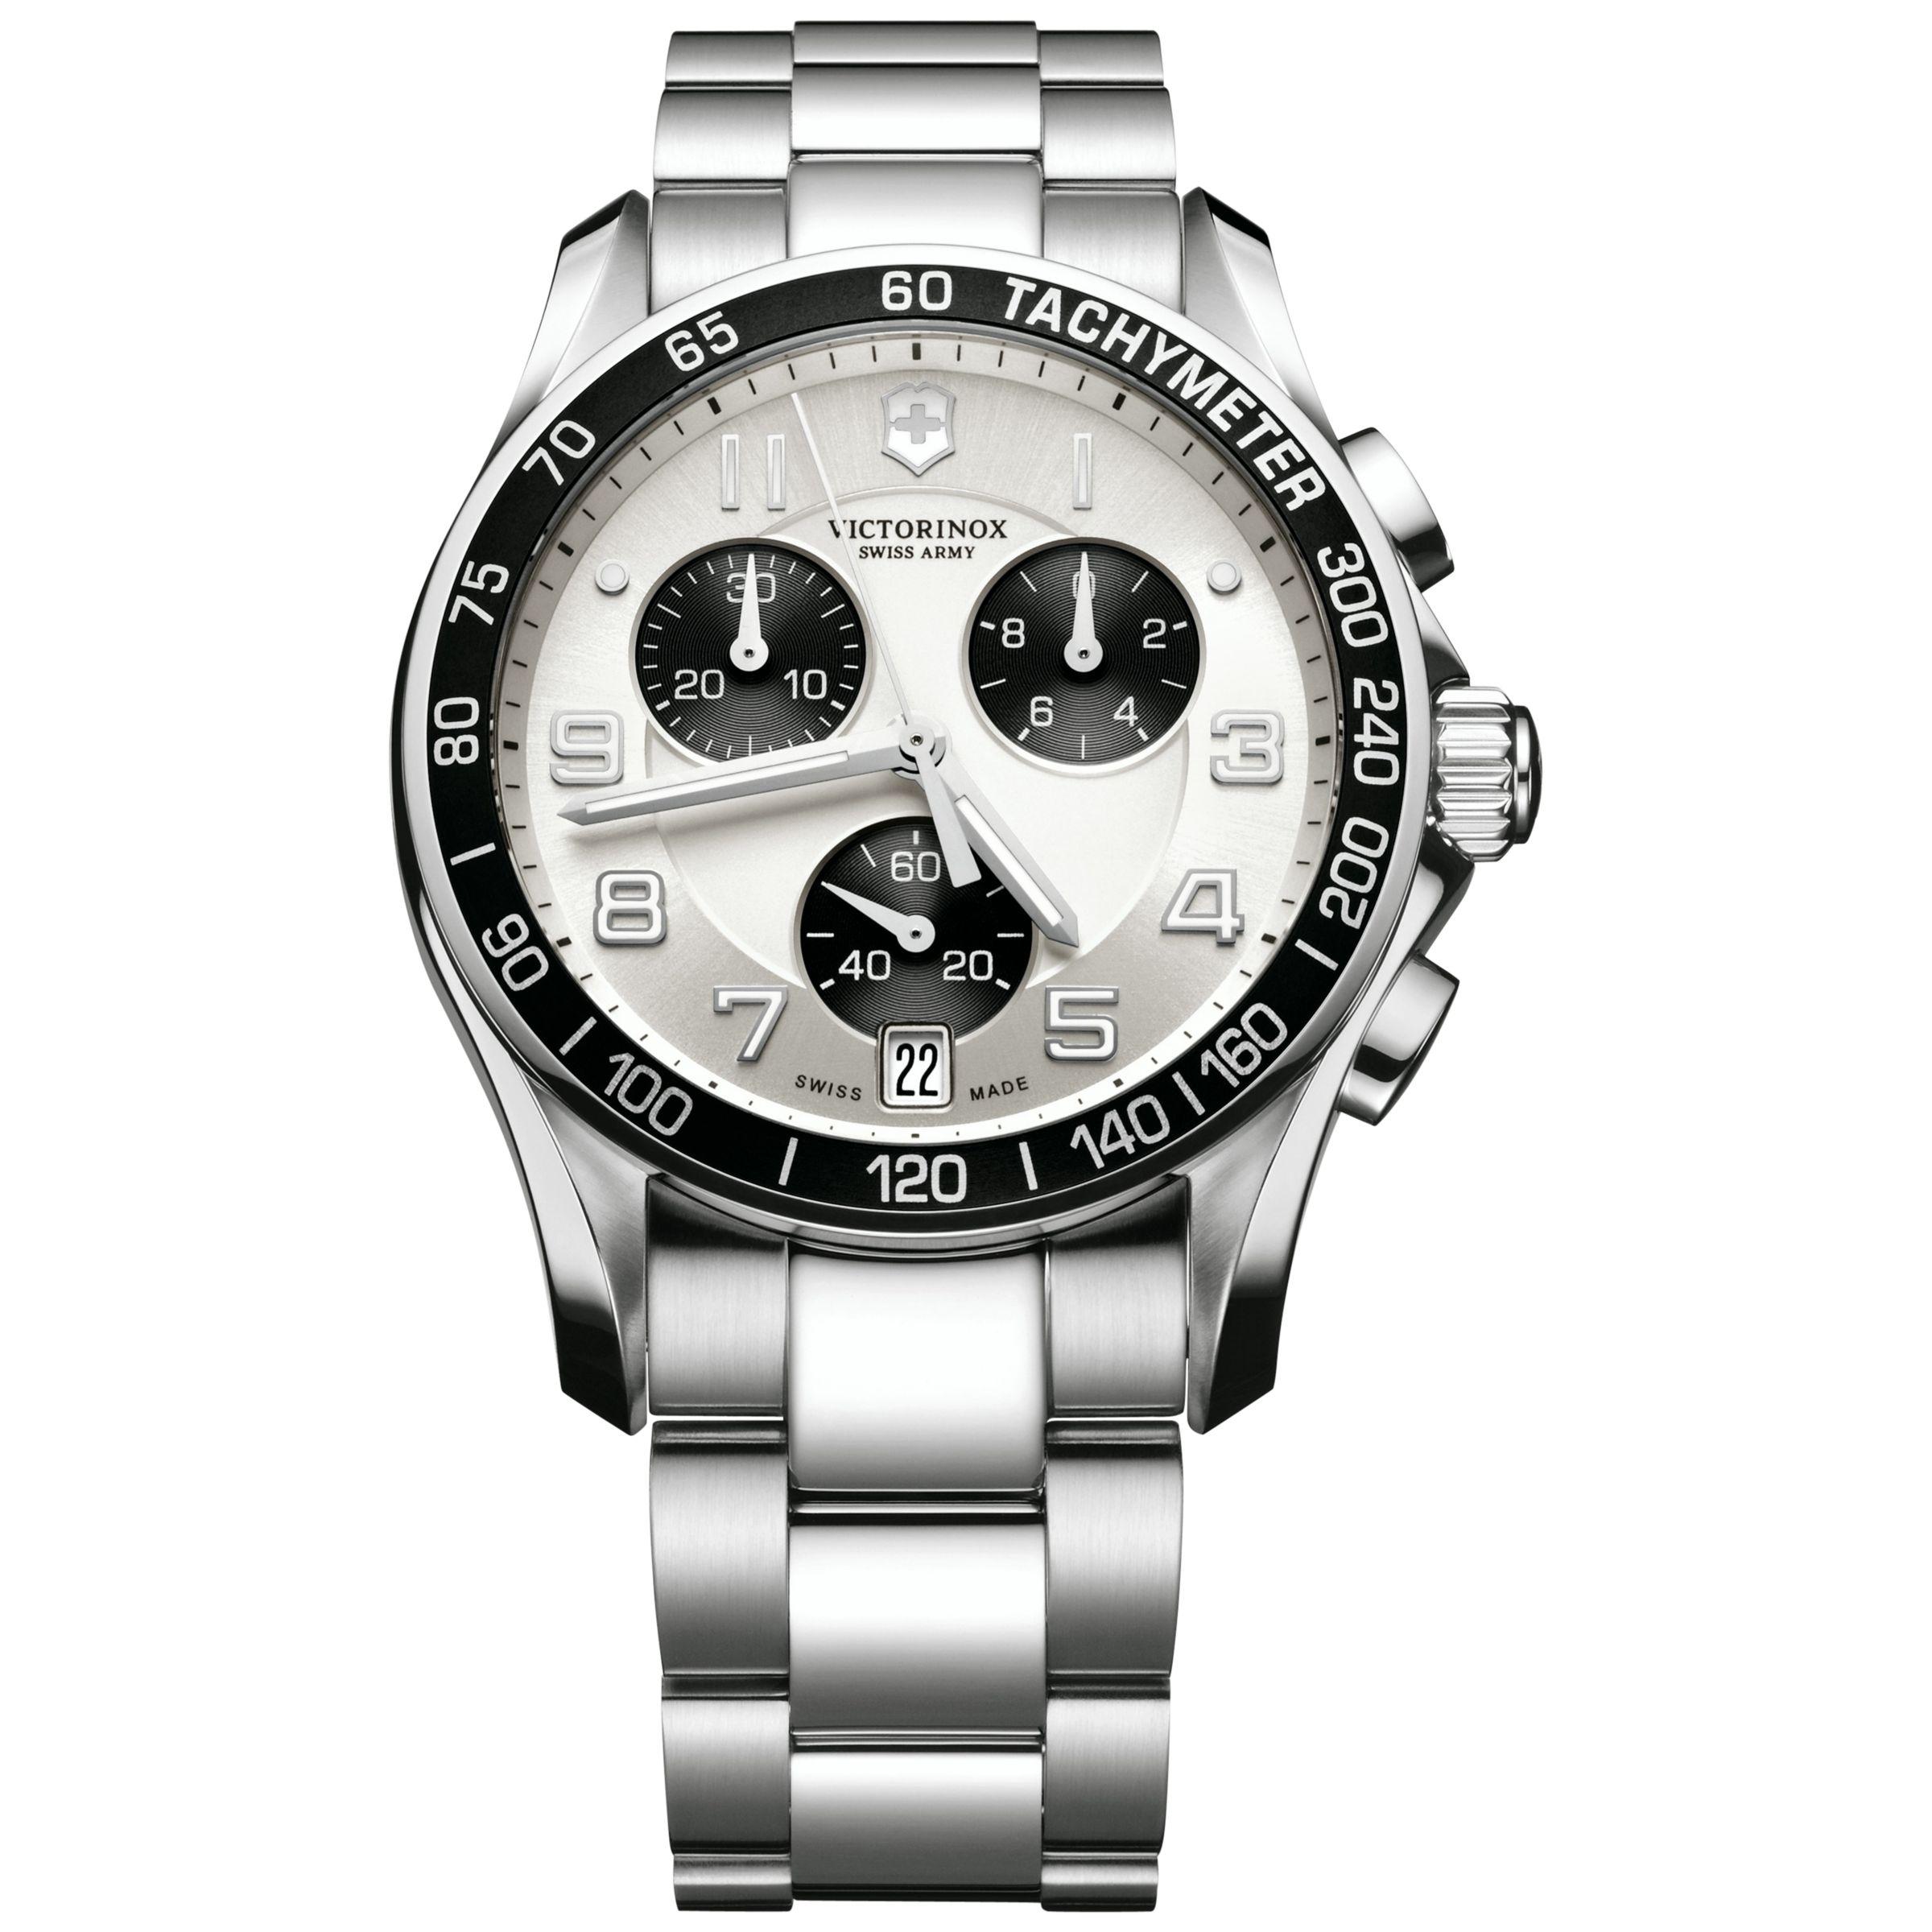 Victorinox Victorinox Men's Chrono Classic Chronograph Bracelet Strap Watch